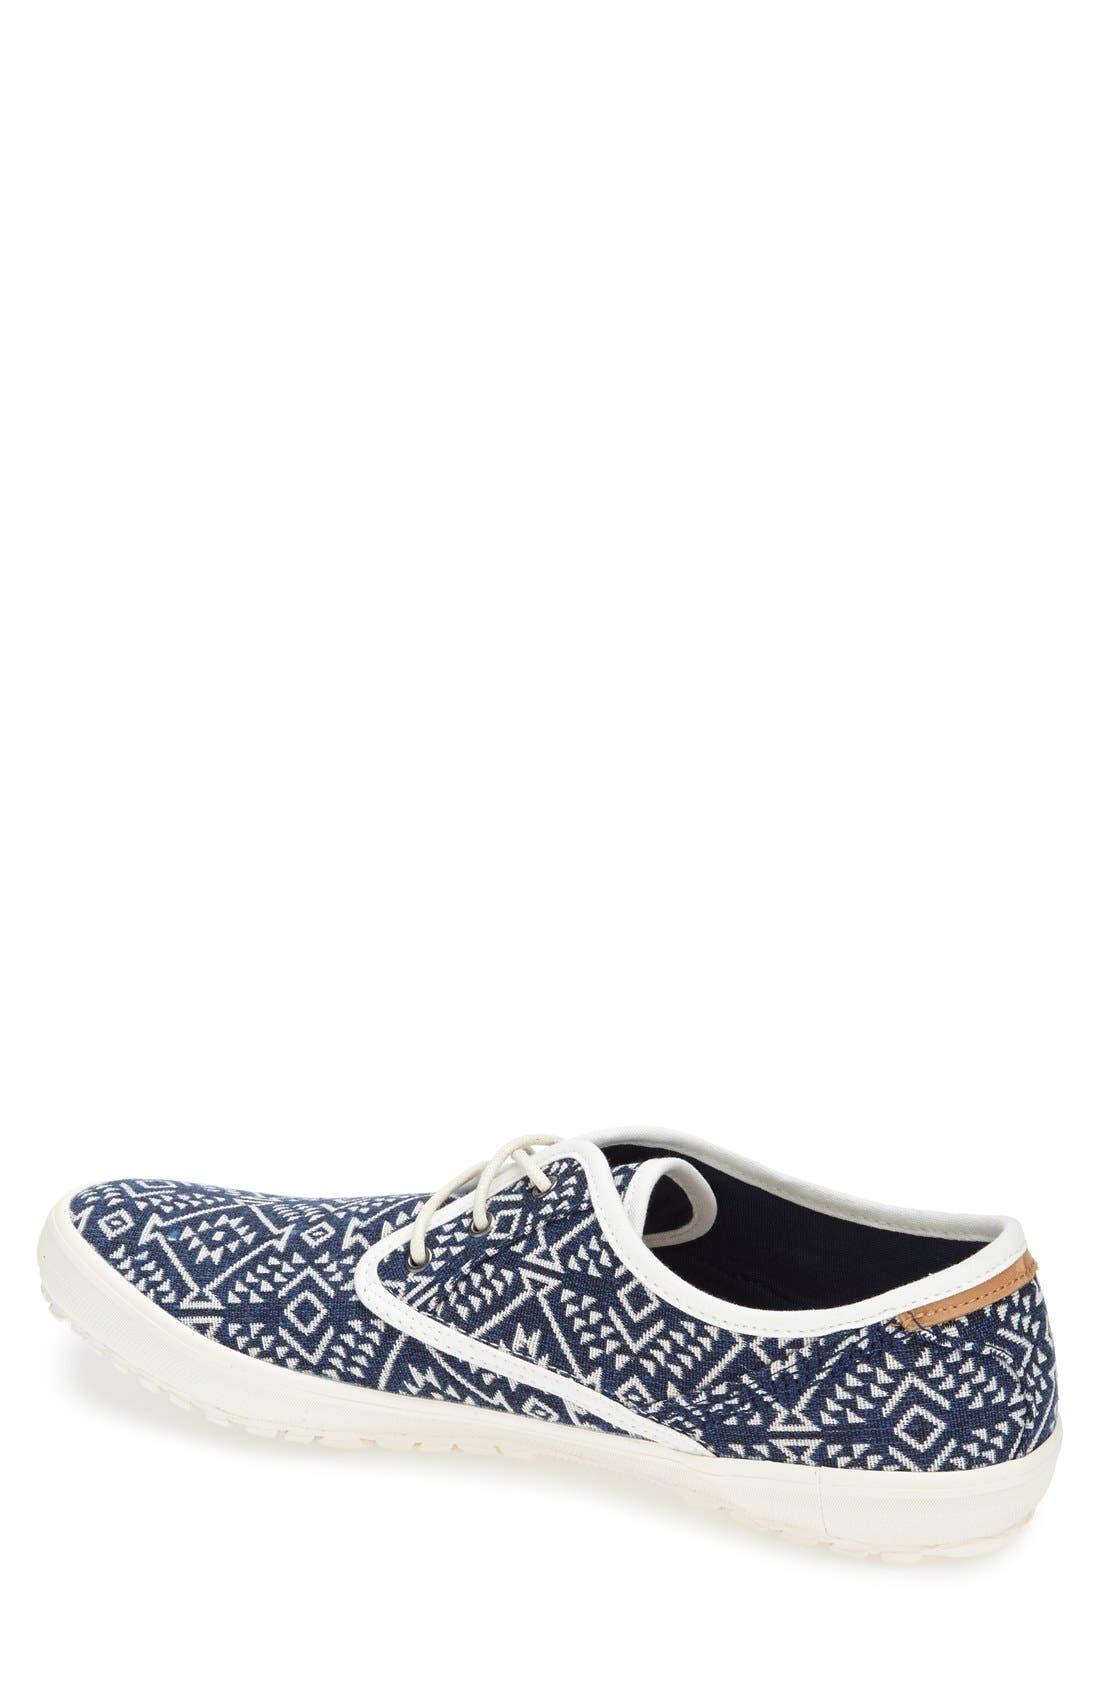 Alternate Image 2  - J SHOES 'Civil' Sneaker